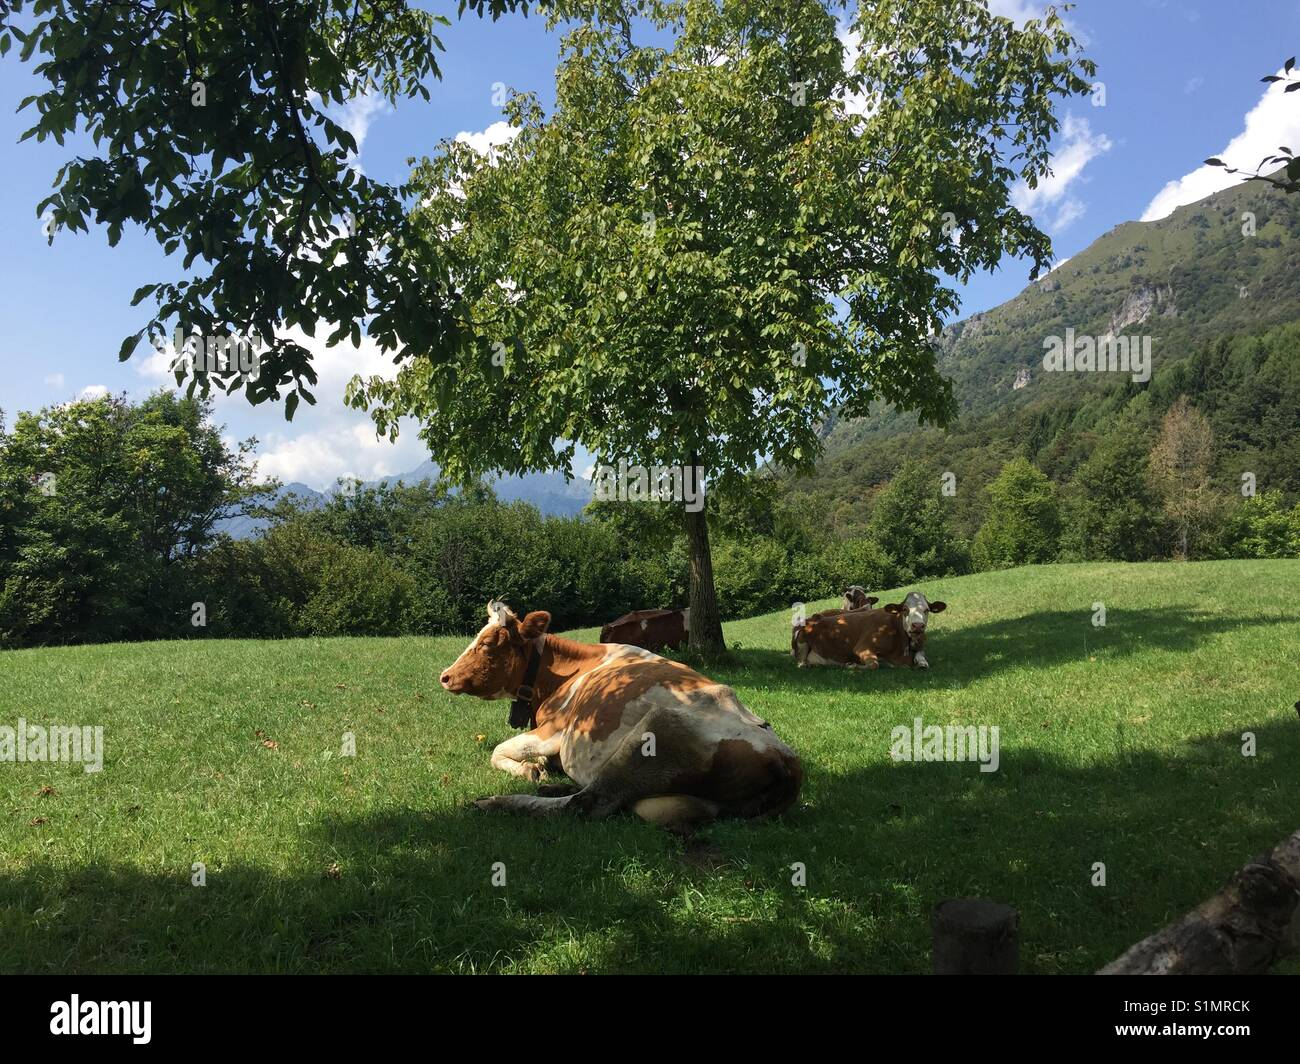 Grandola ed Uniti, Italia. Immagini Stock